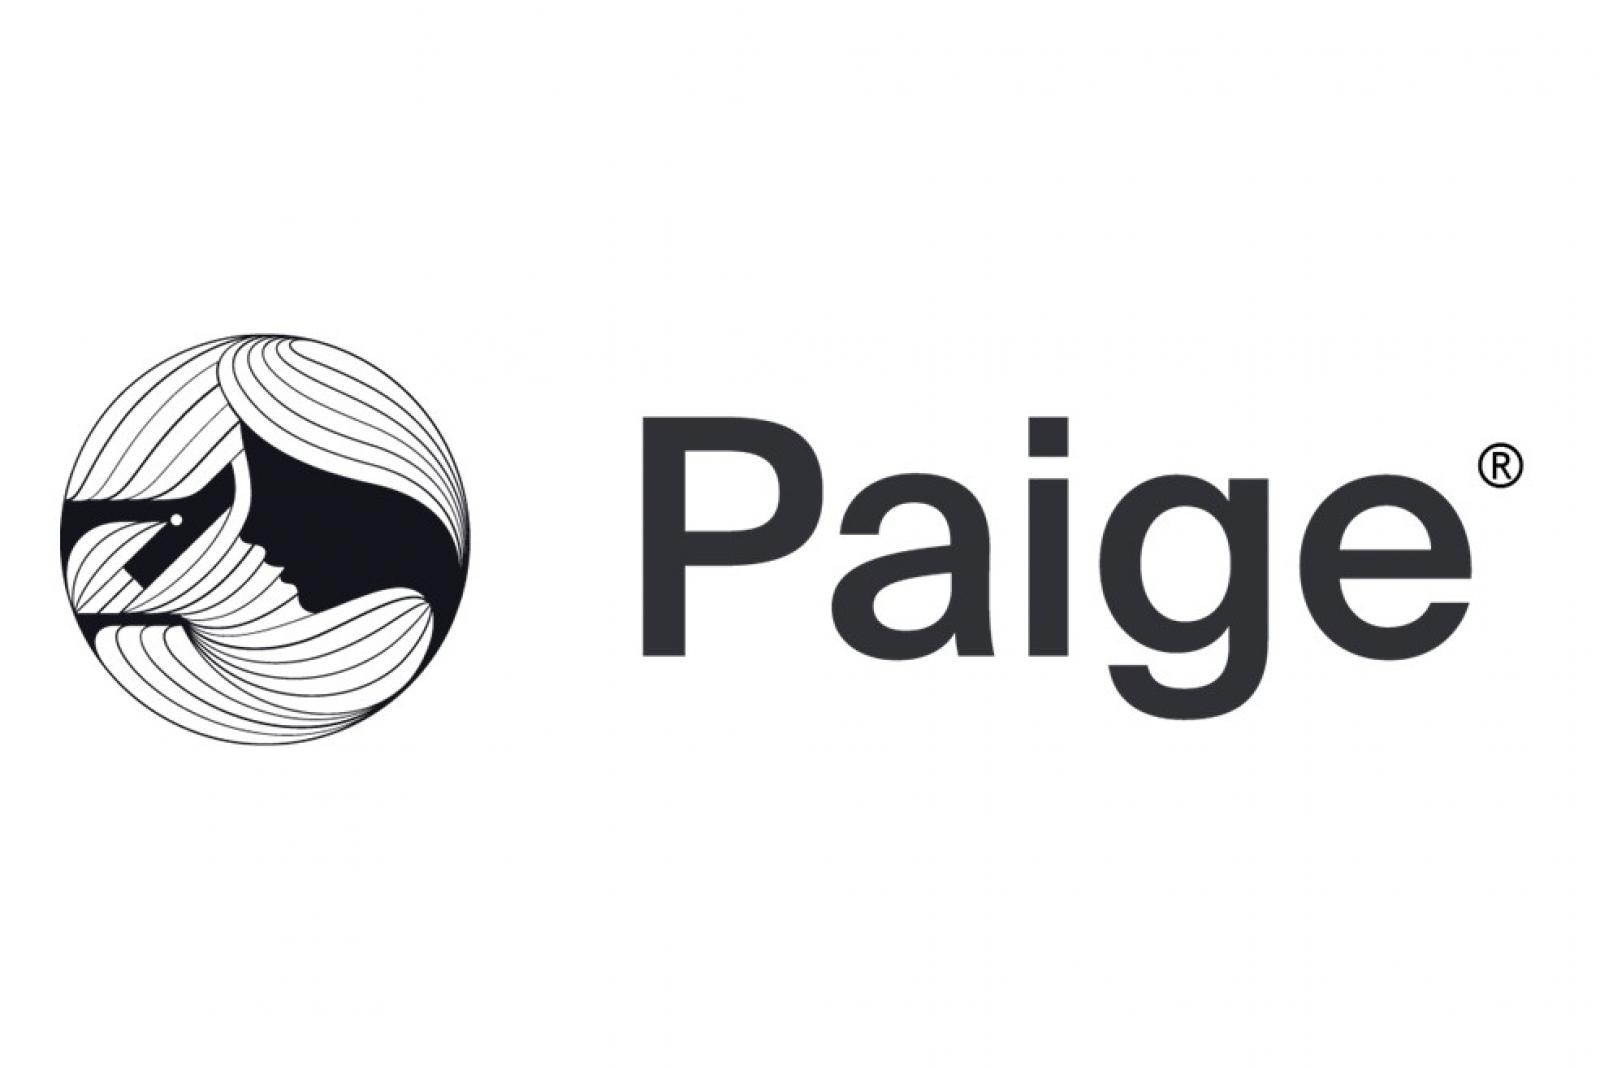 Paige sponsor